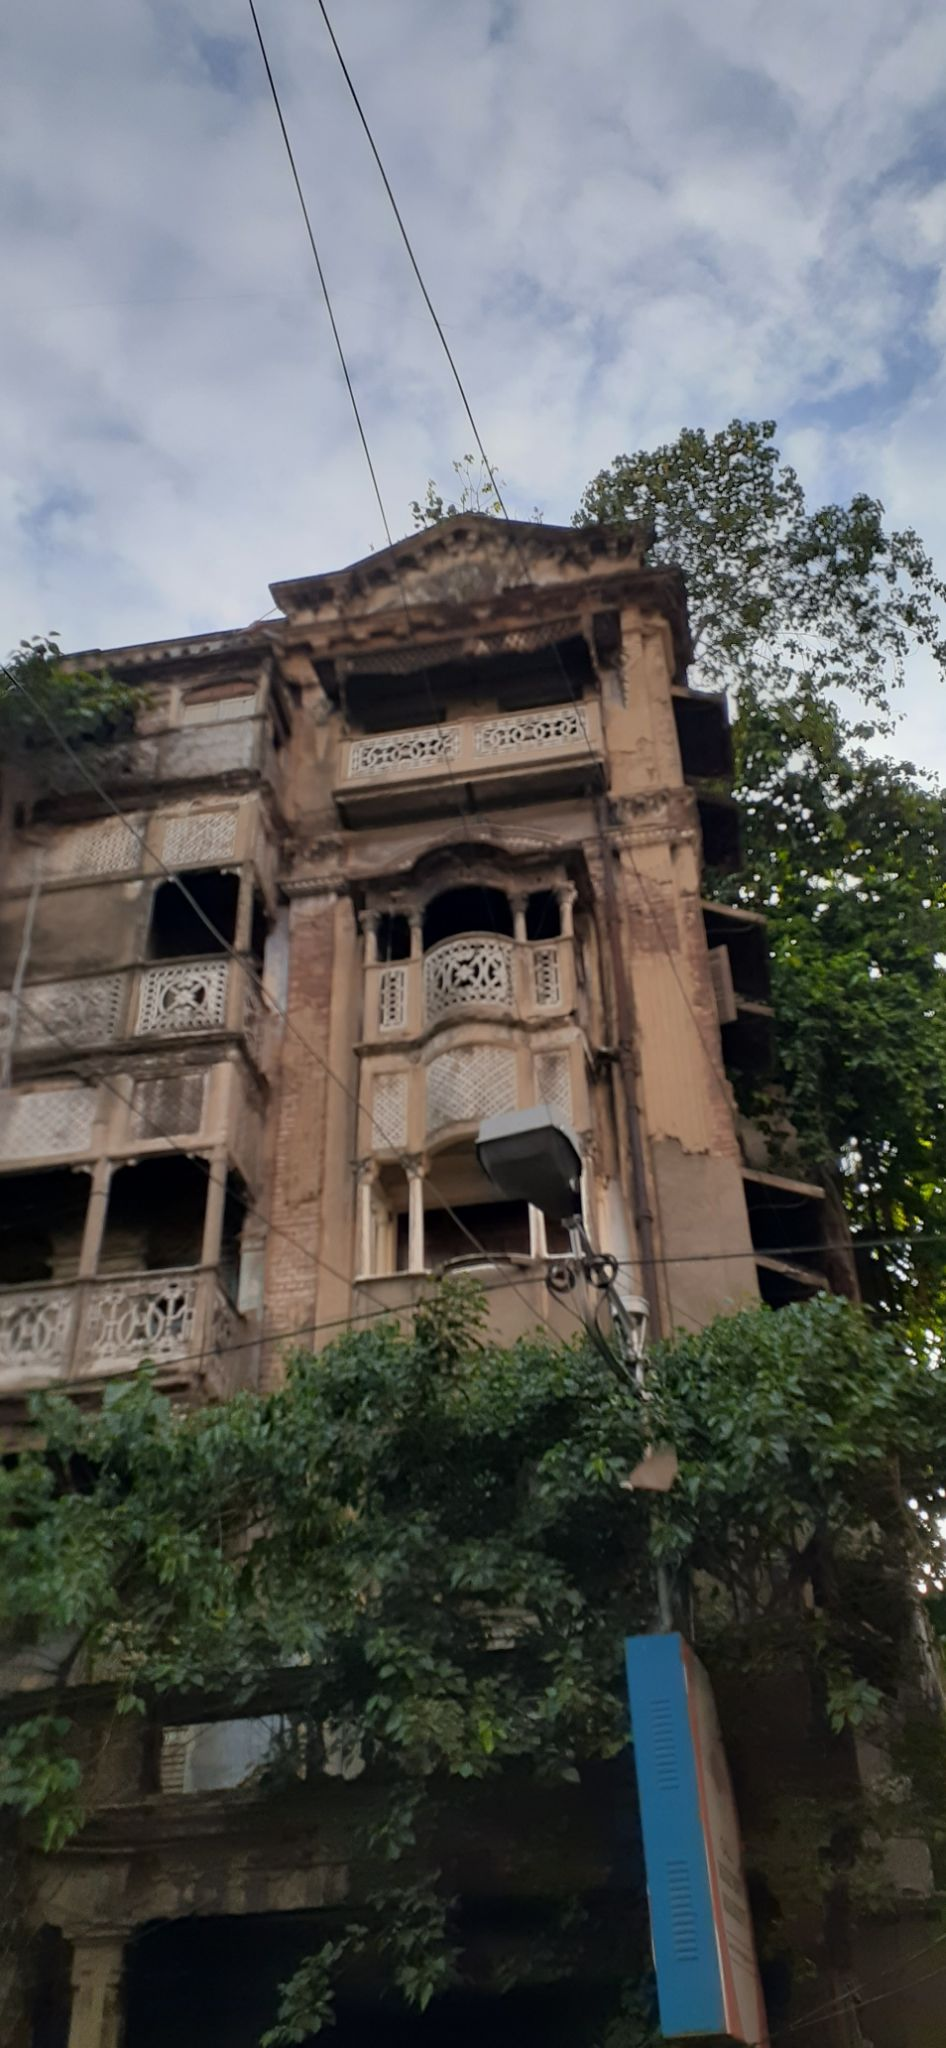 Photo of Kolkata By Ajay Chakrabarti